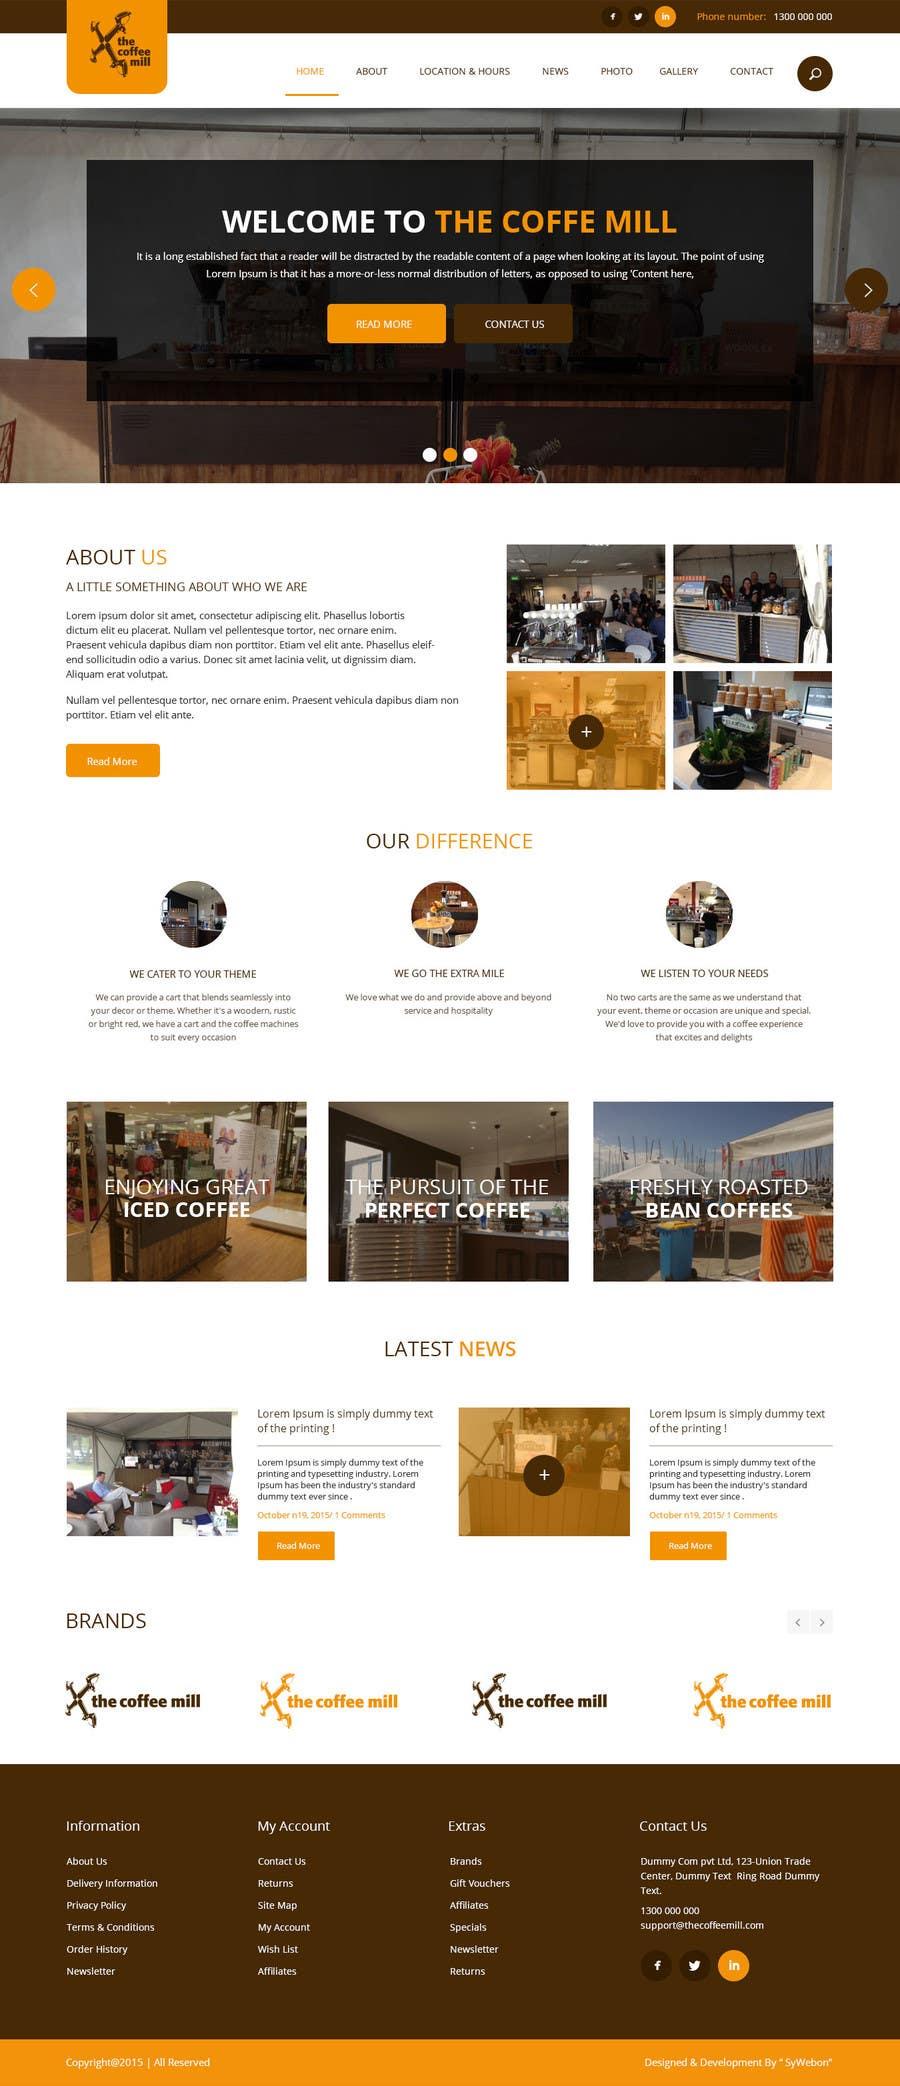 Konkurrenceindlæg #                                        29                                      for                                         Design a Website Mockup for a Mobile Coffee Business